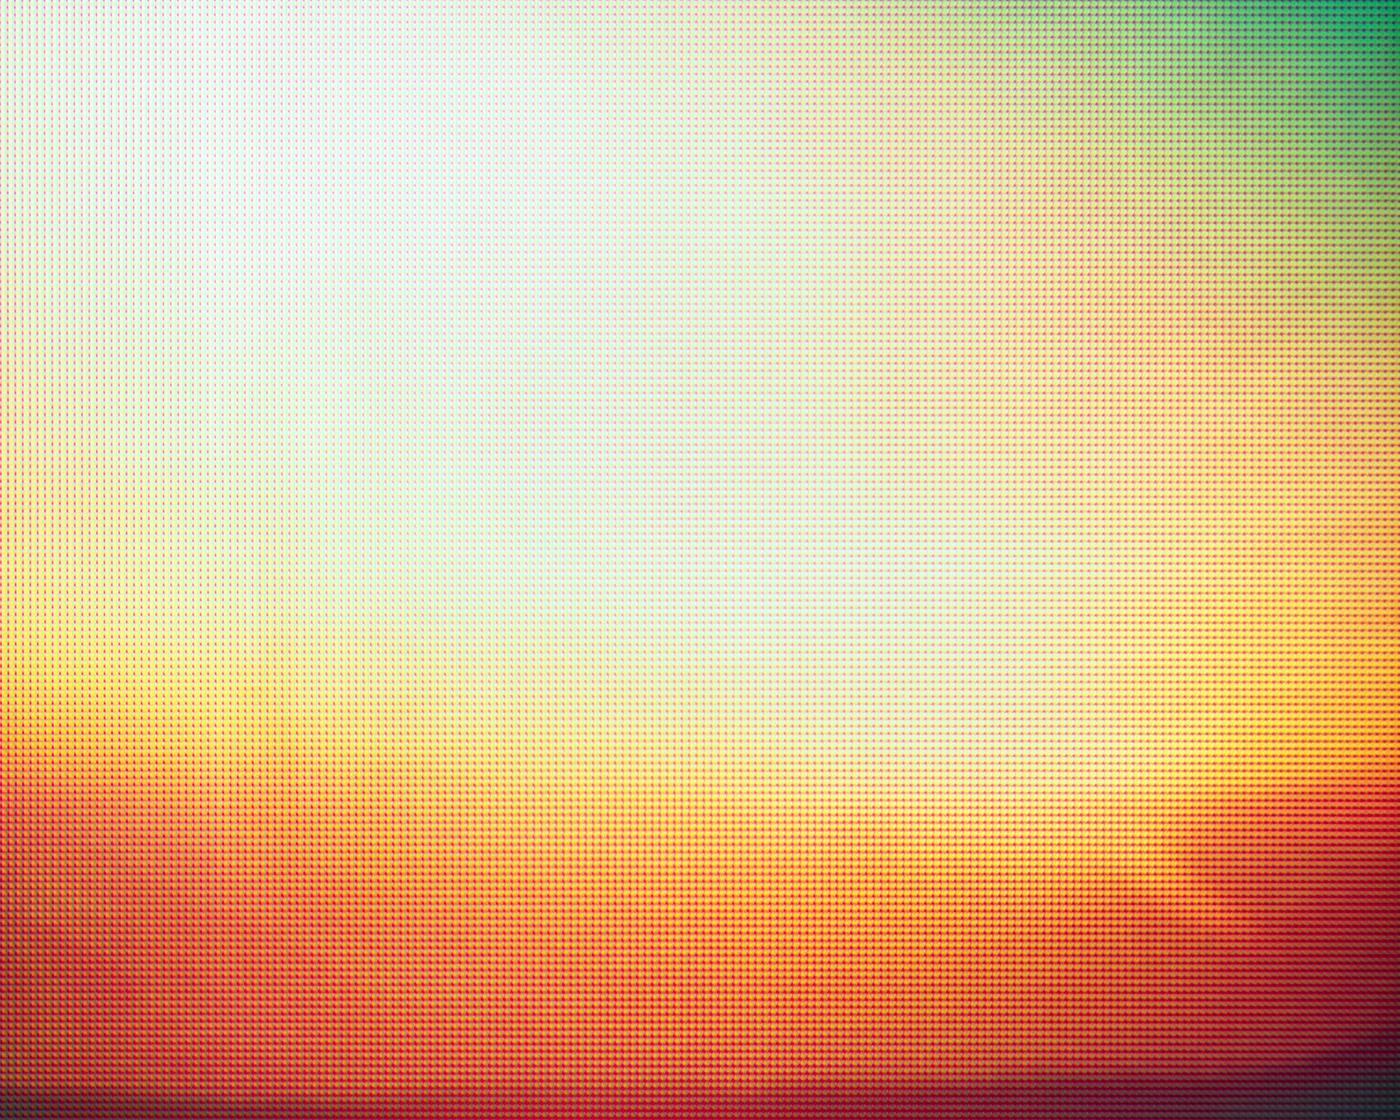 sg_sunset_28.jpg